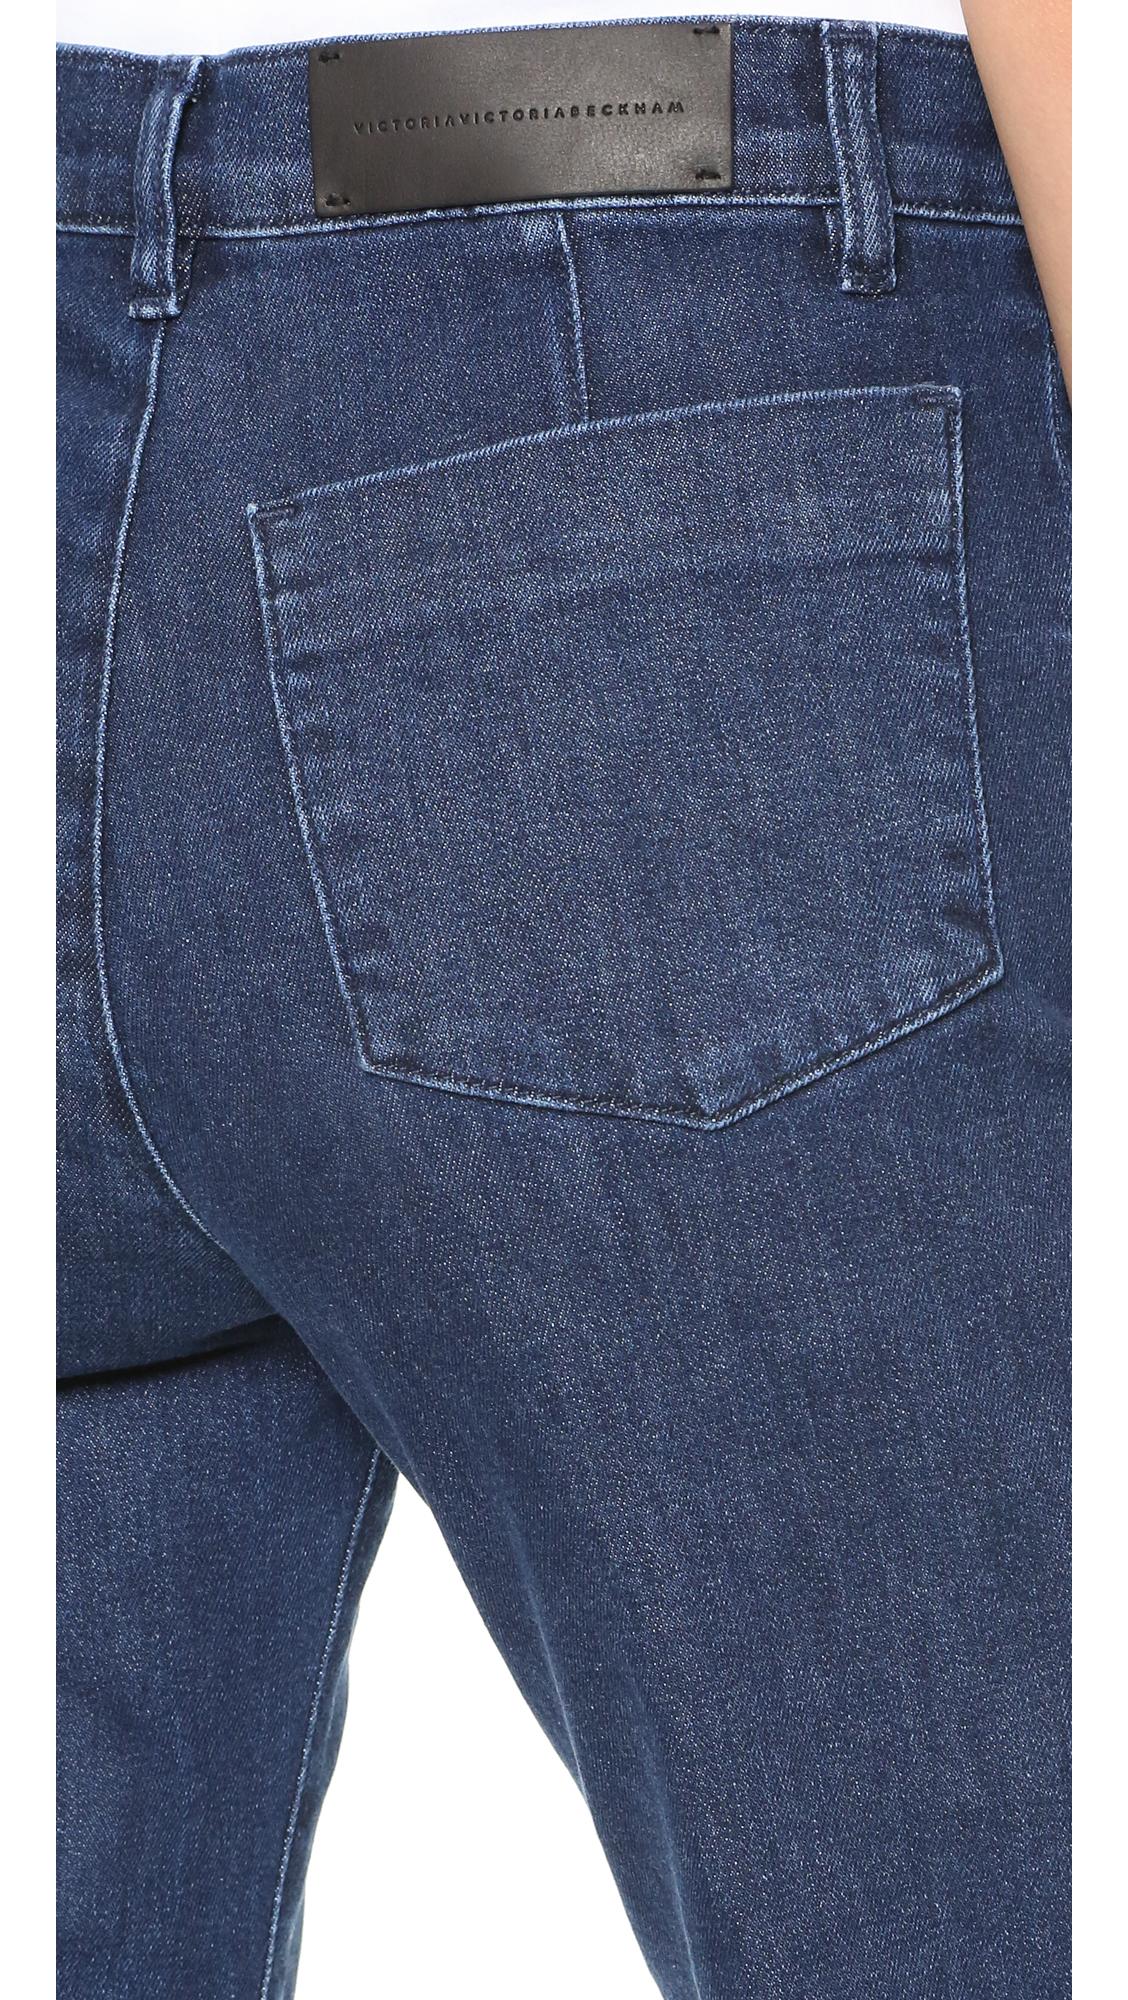 victoria victoria beckham creased wide leg jeans in blue lyst. Black Bedroom Furniture Sets. Home Design Ideas